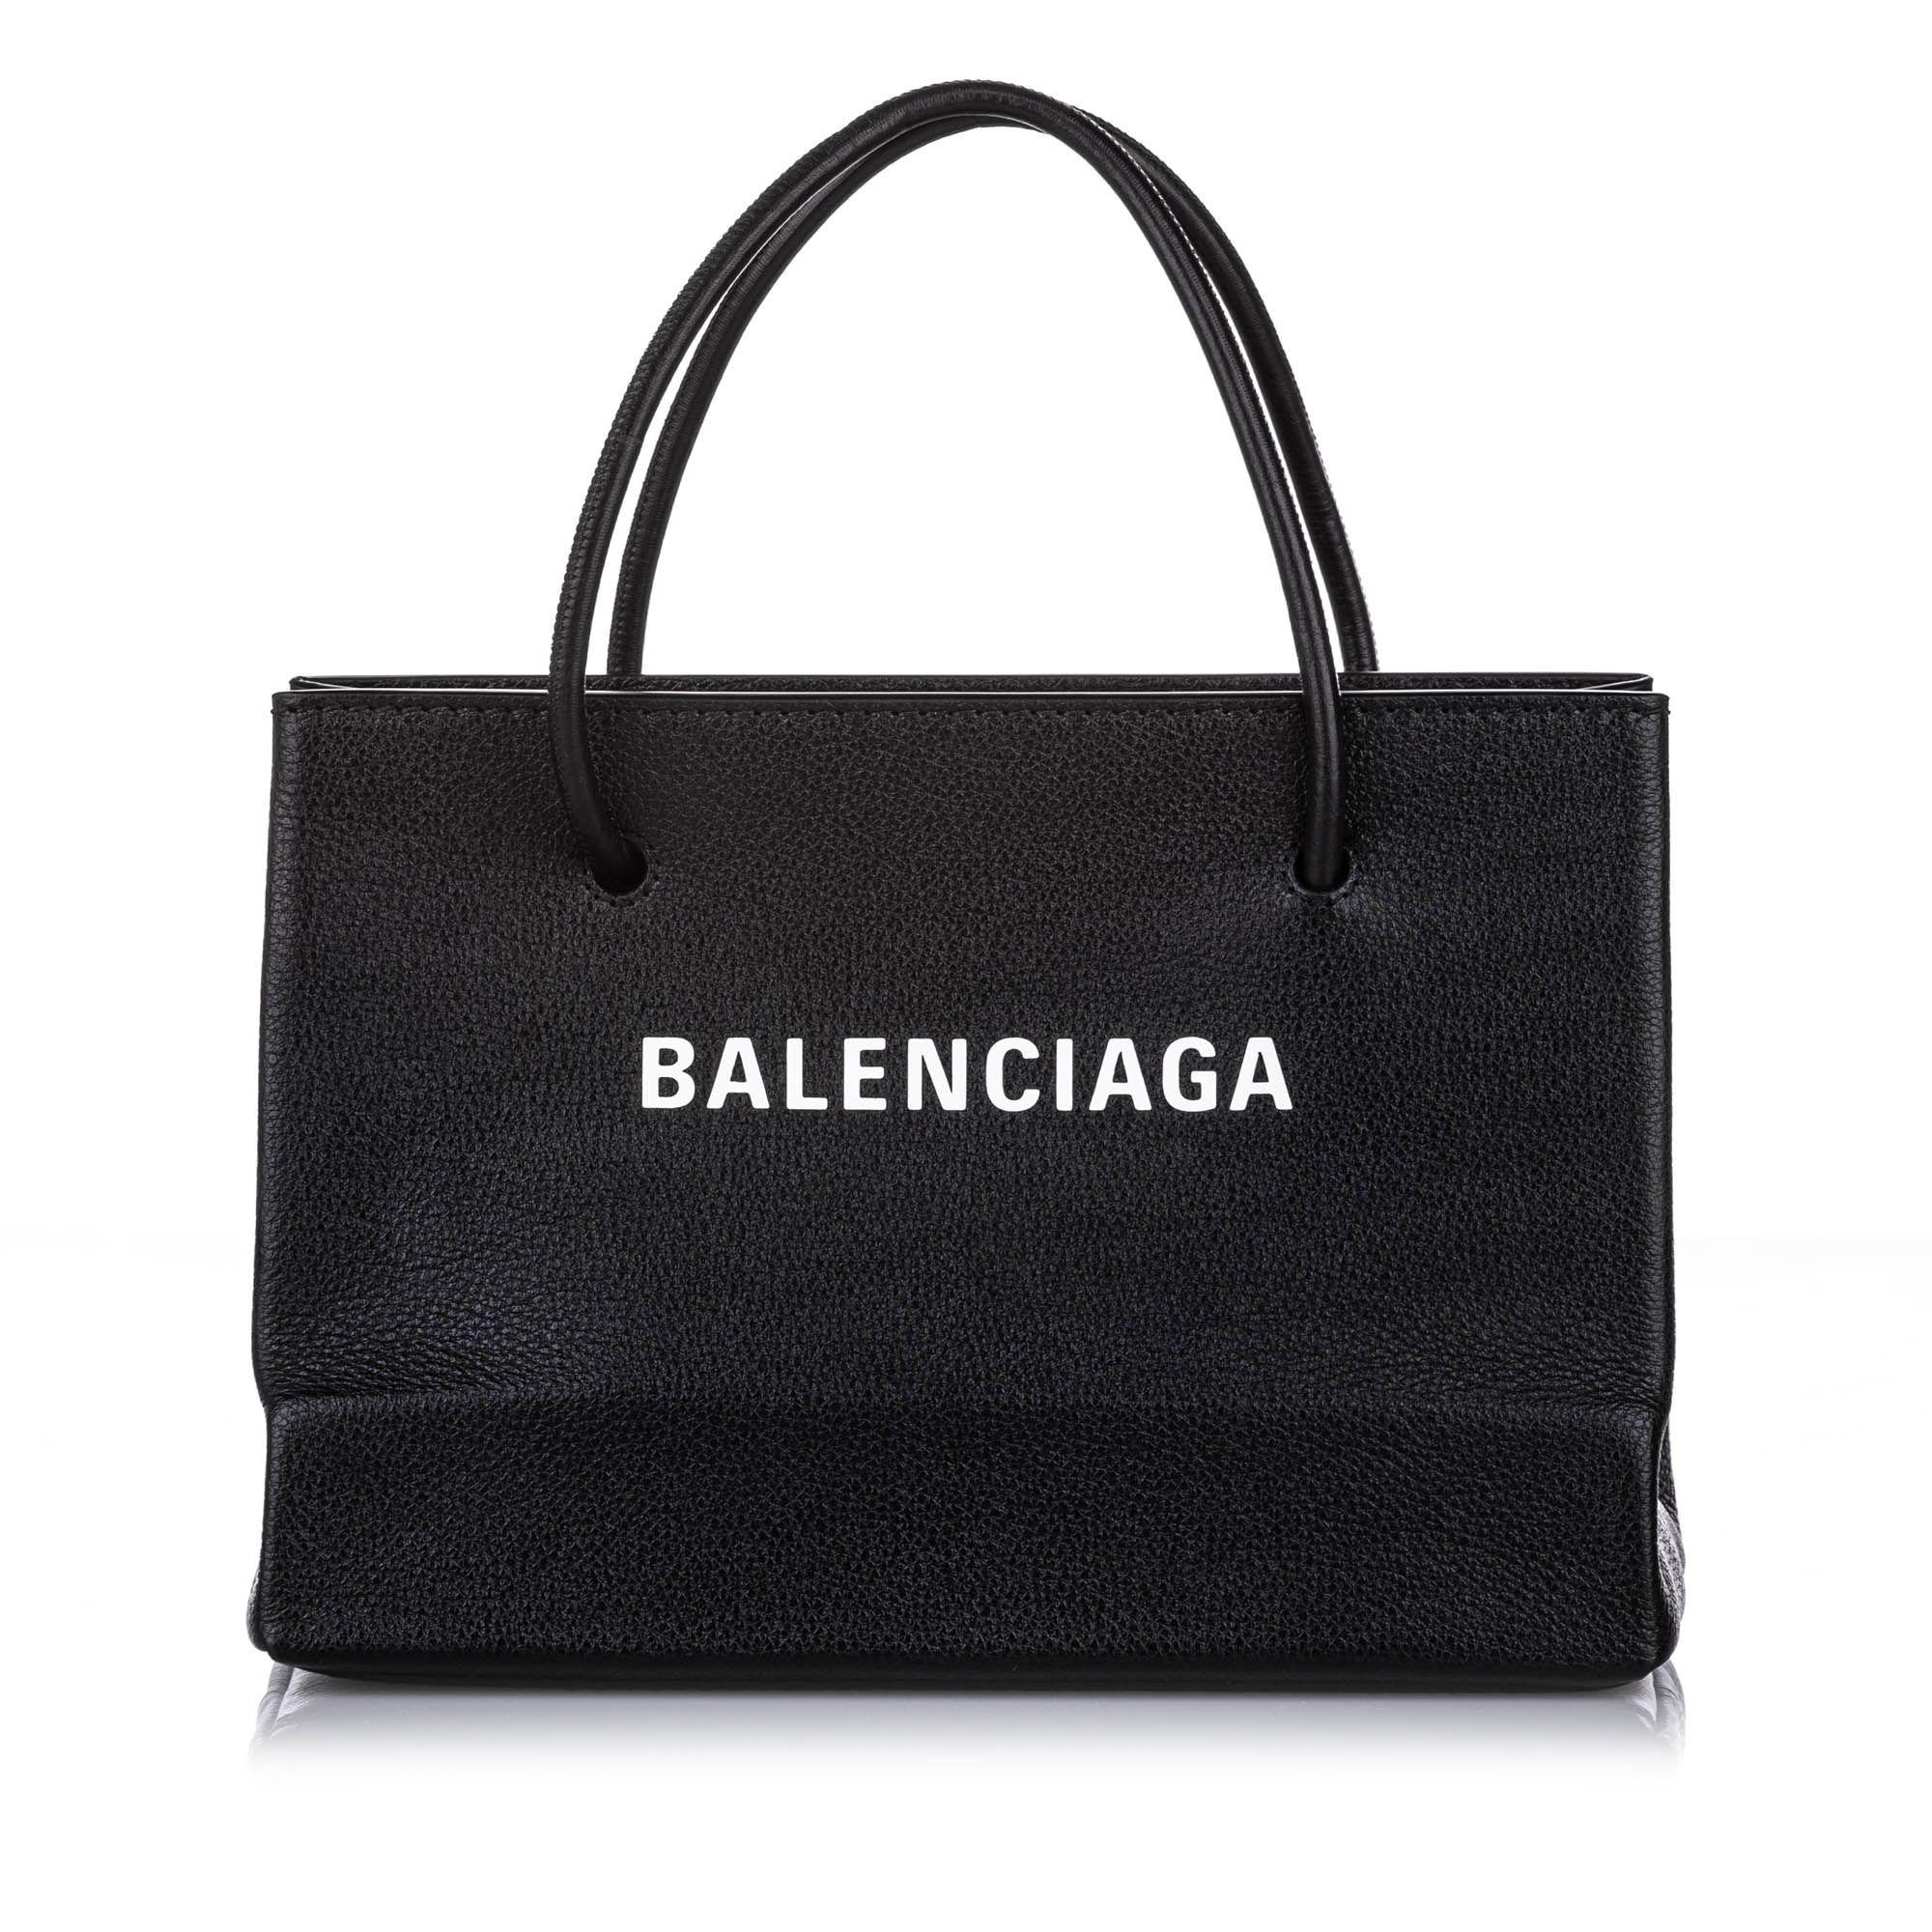 Balenciaga S Shopping Leather Satchel Black